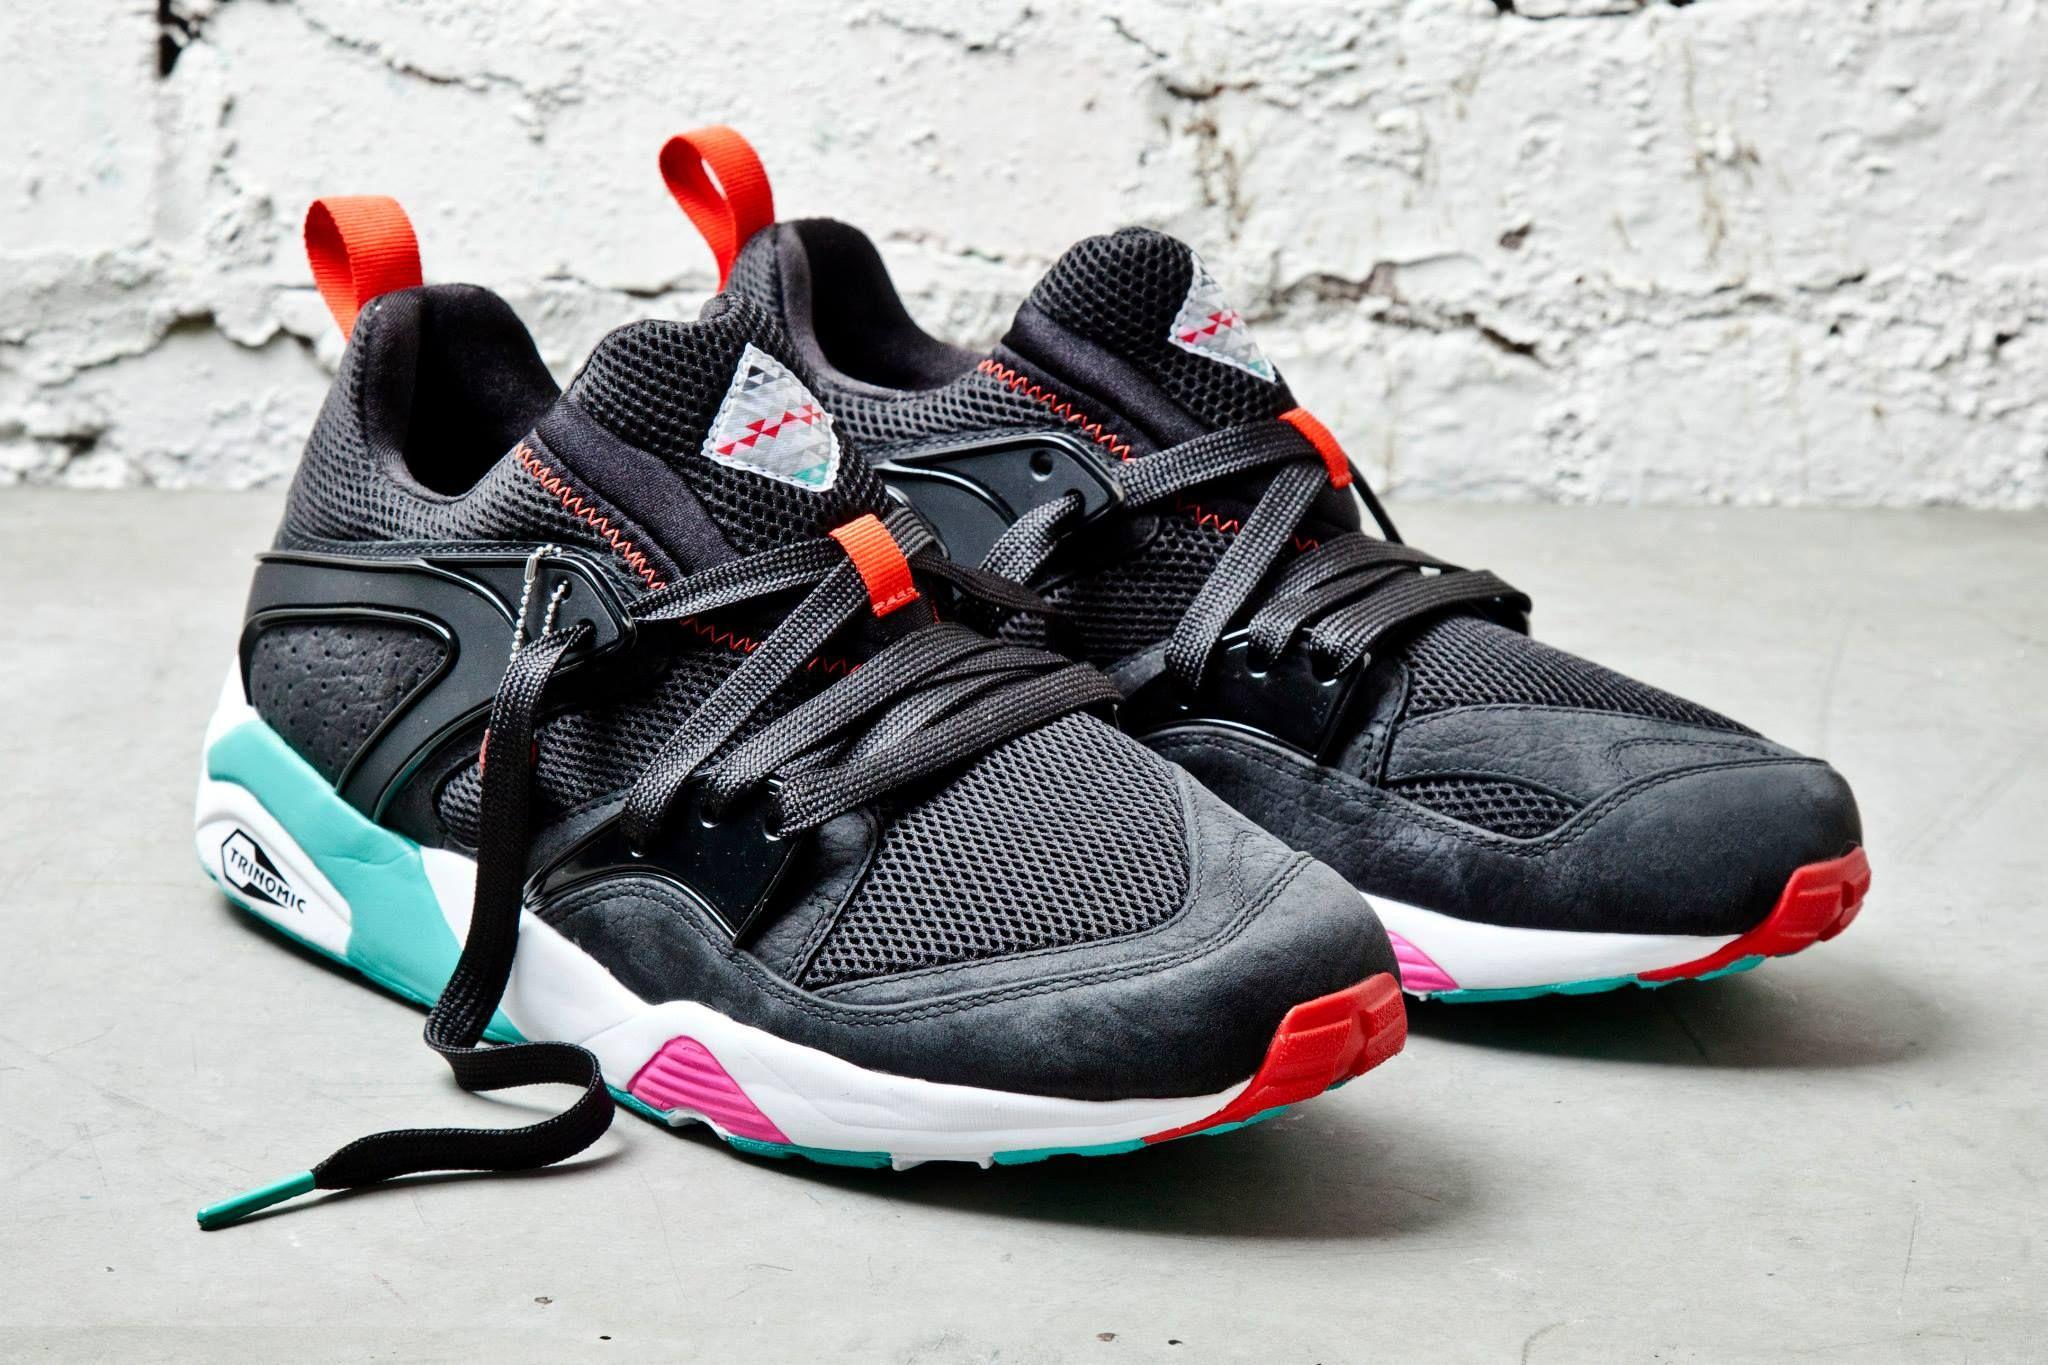 28e2eb309b Sneaker Freaker x Puma Blaze Of Glory